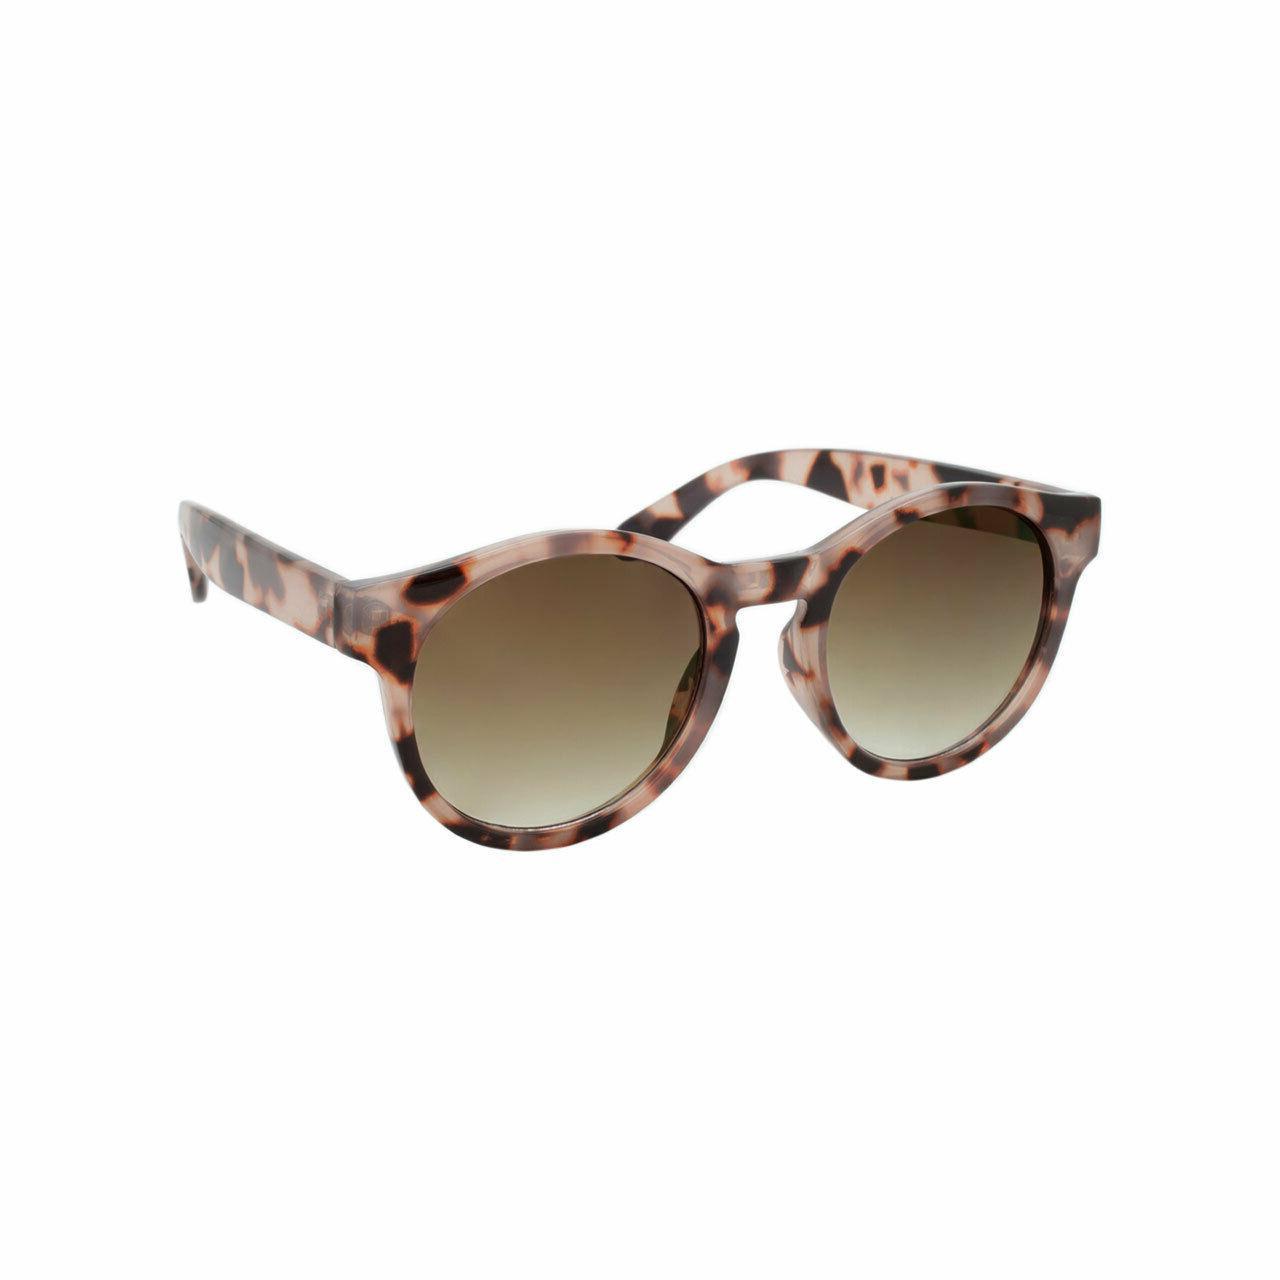 Bulk Wholesale Fashion Sunglasses Eyeglasses Men Women Styles